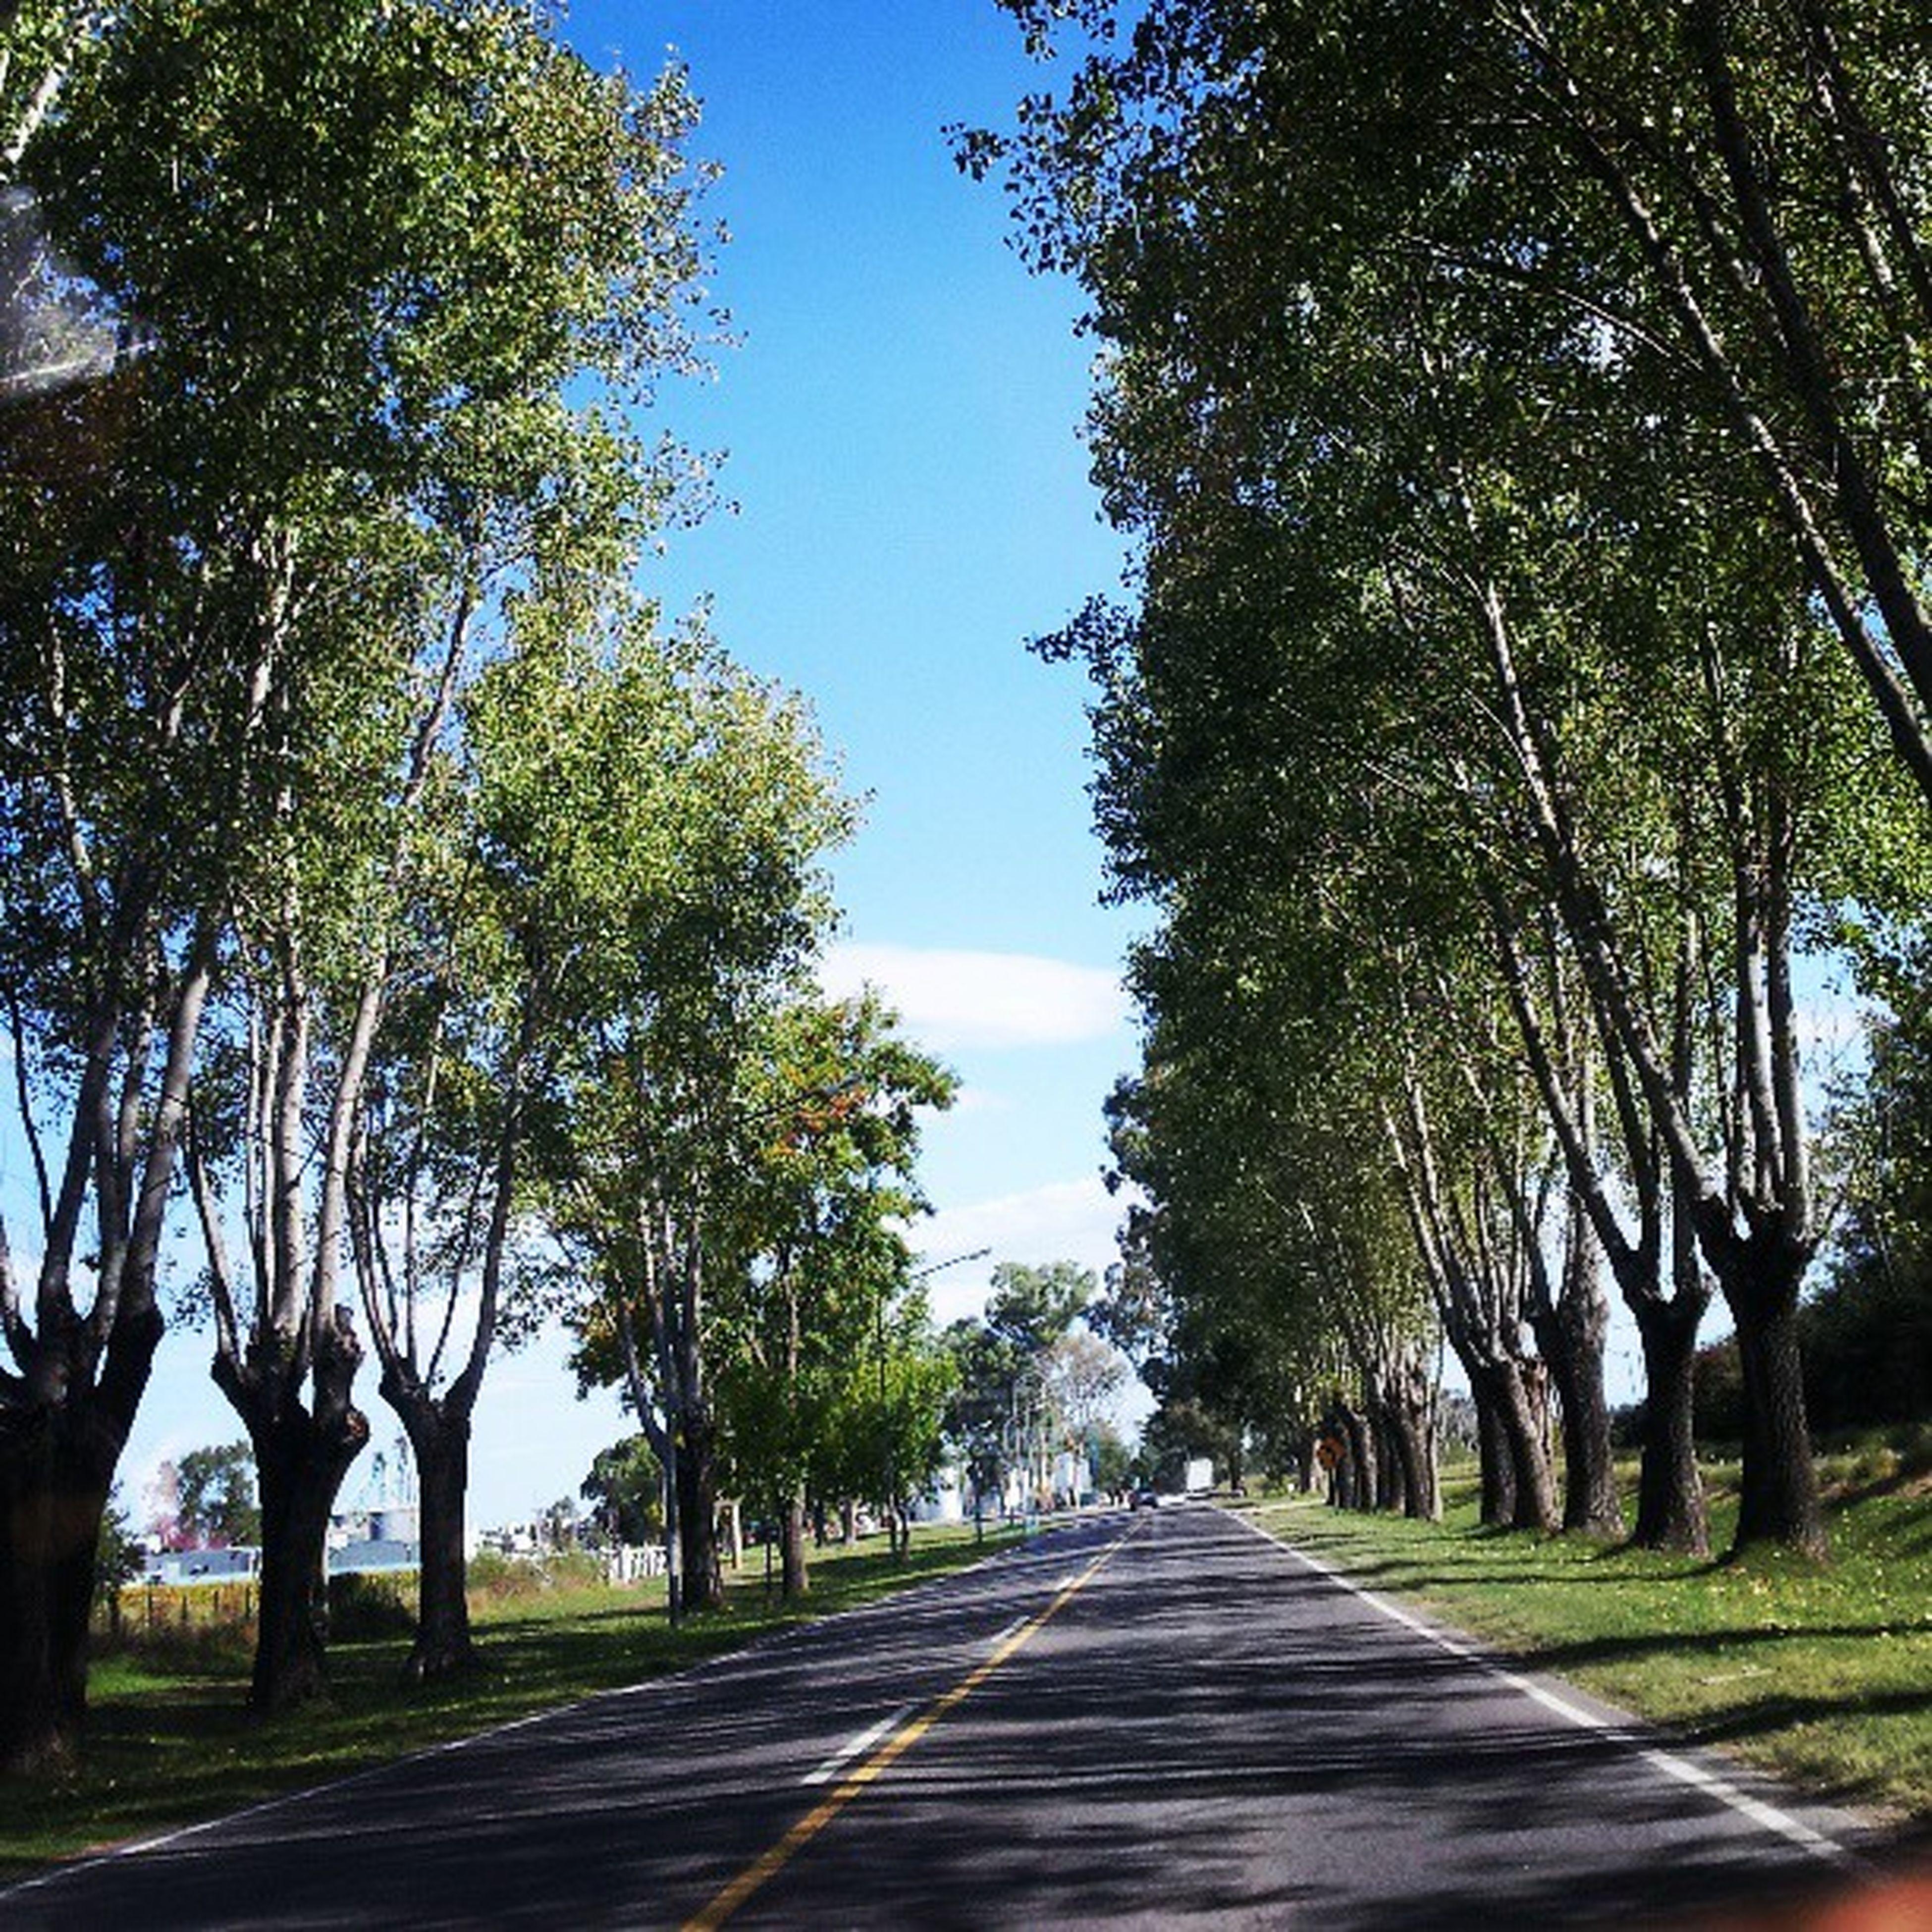 the way forward, tree, diminishing perspective, vanishing point, road, treelined, empty road, transportation, tranquility, long, empty, clear sky, tranquil scene, nature, footpath, growth, sunlight, sky, street, tree trunk